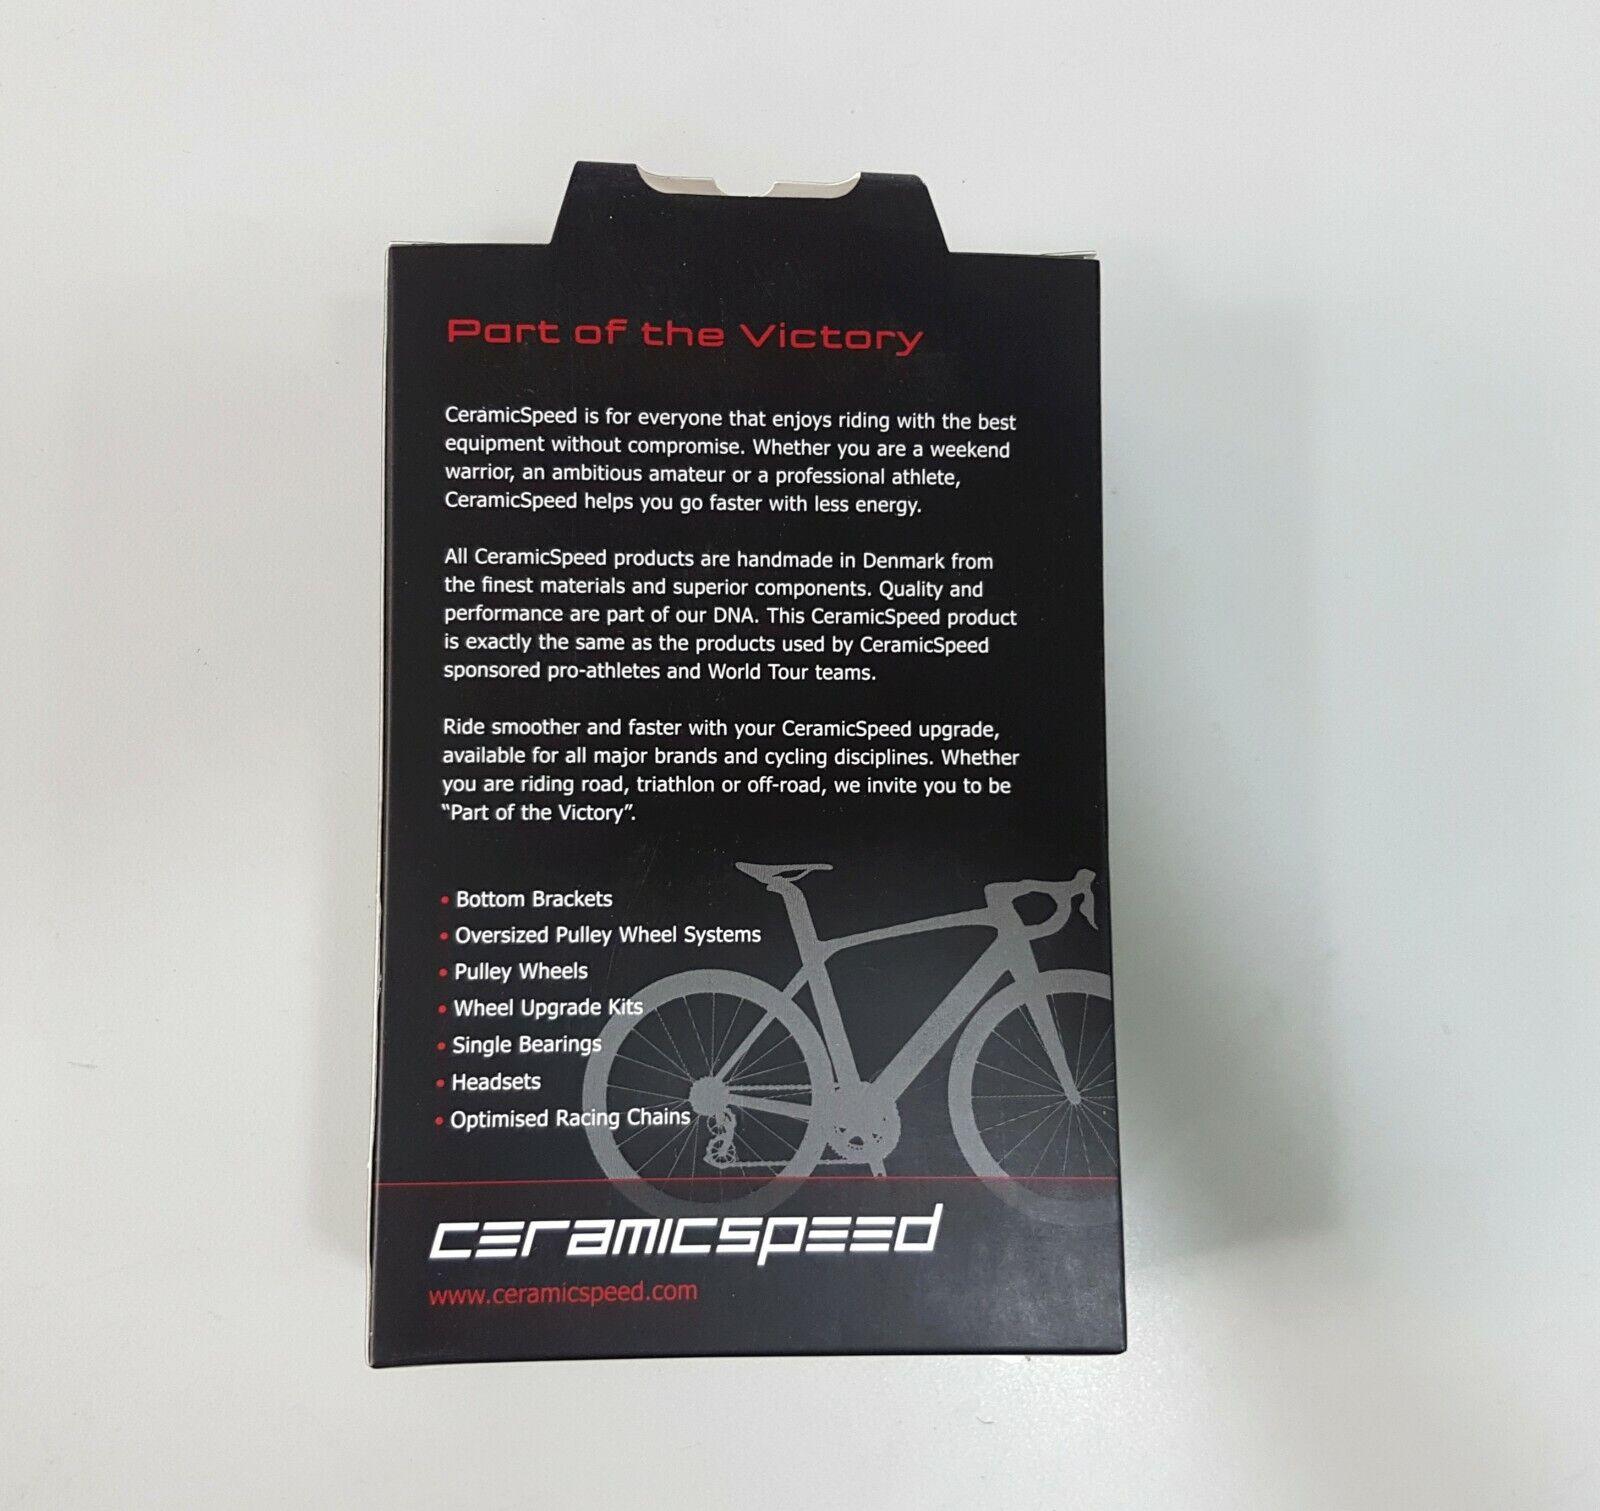 CeramicSpeed T45 Campy UT Bicycle Cycle Bike Bottom Bracket Black